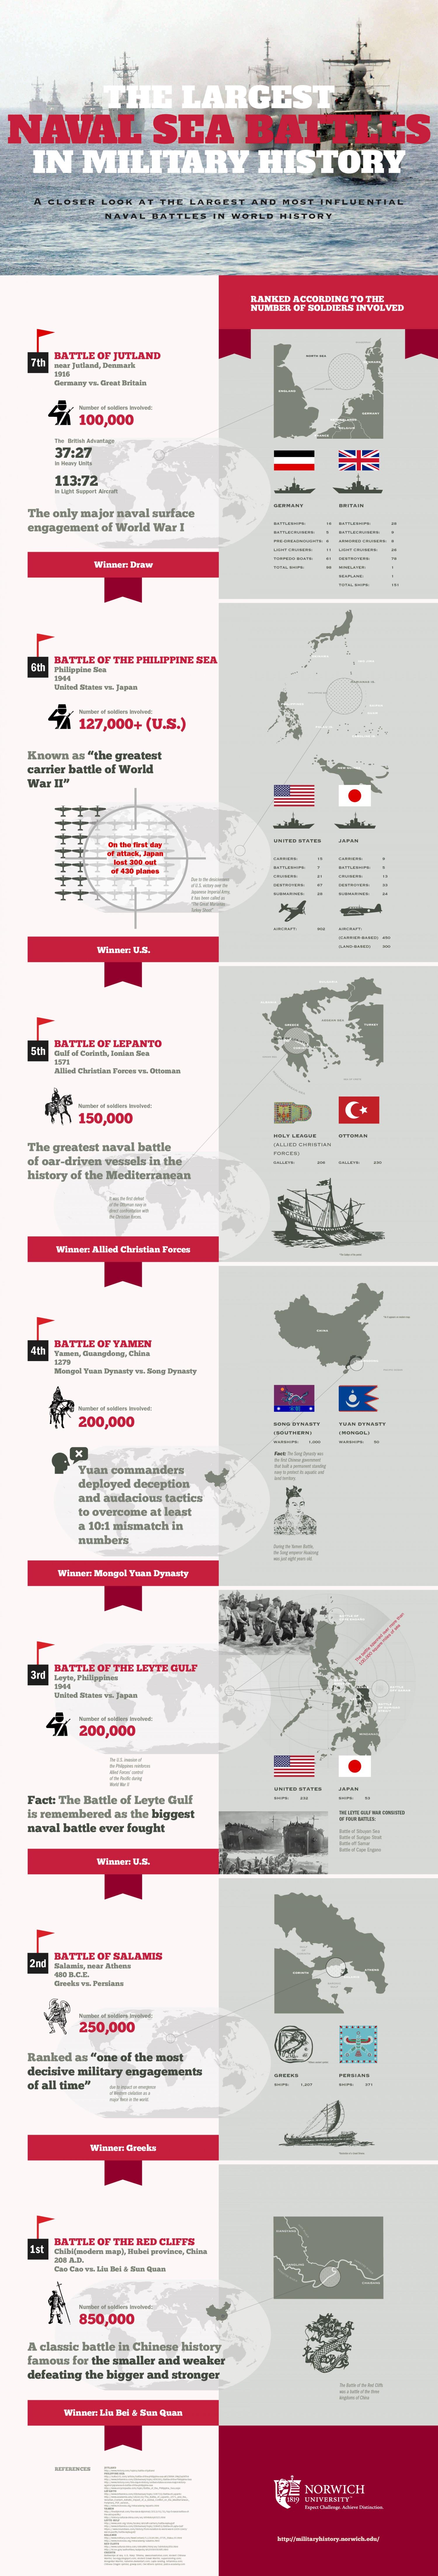 15. Largest naval sea battles military history